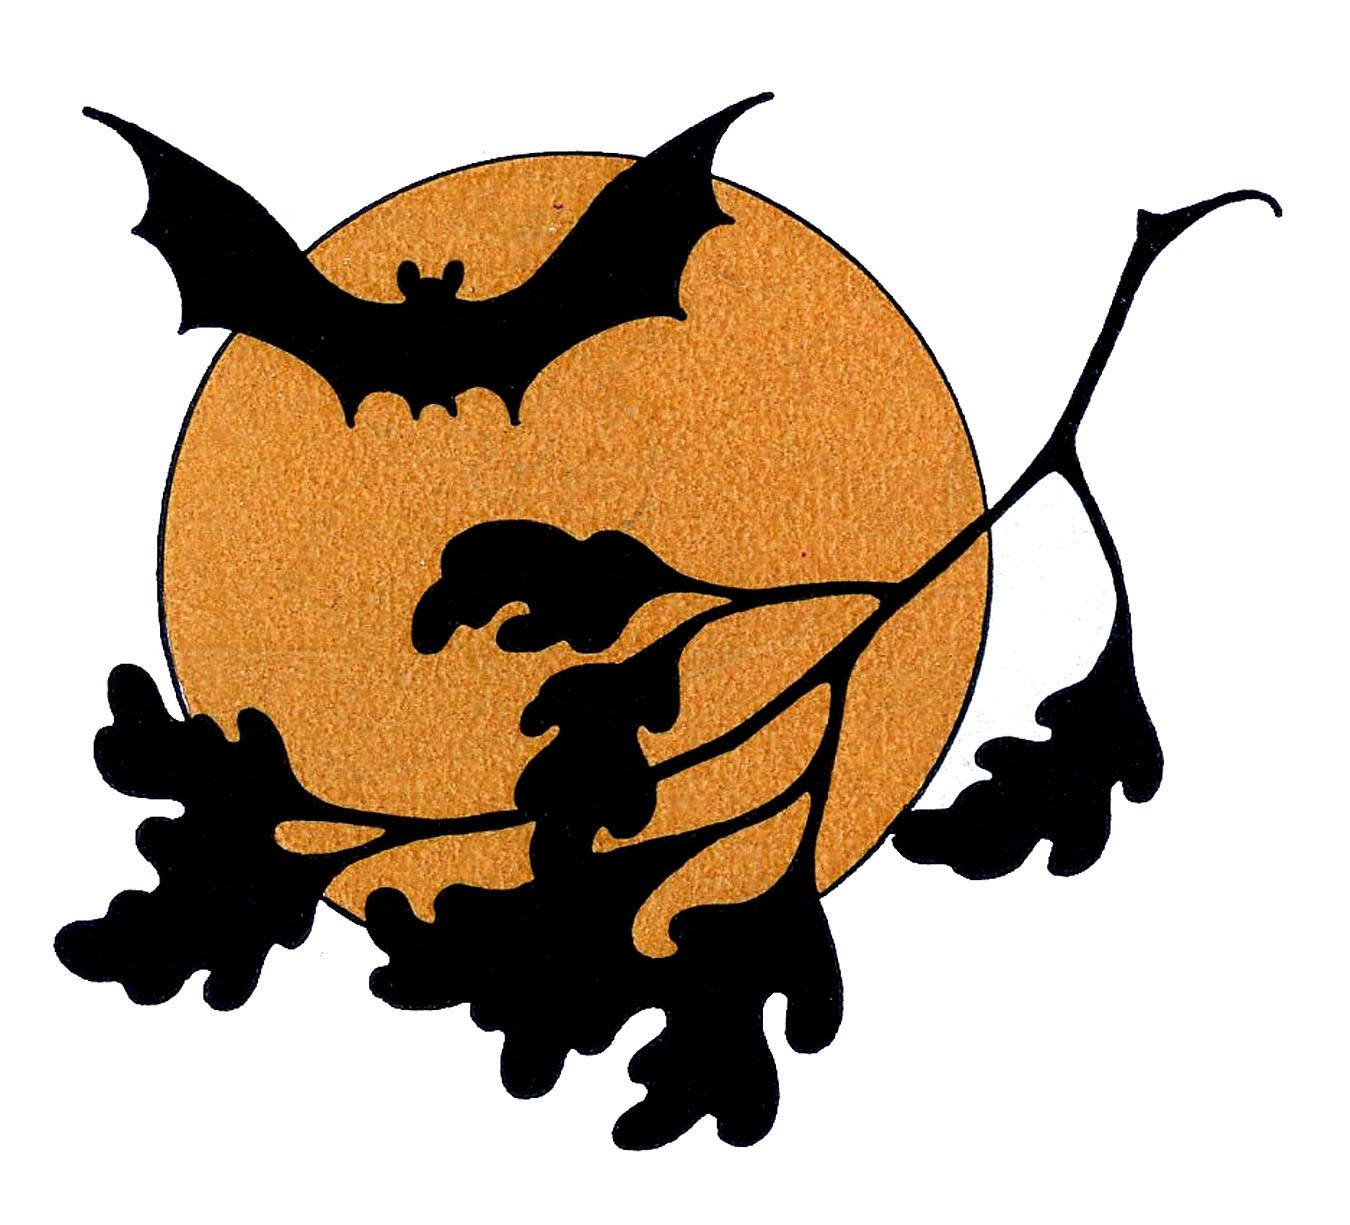 Bat sleeping. Images vintage halloween